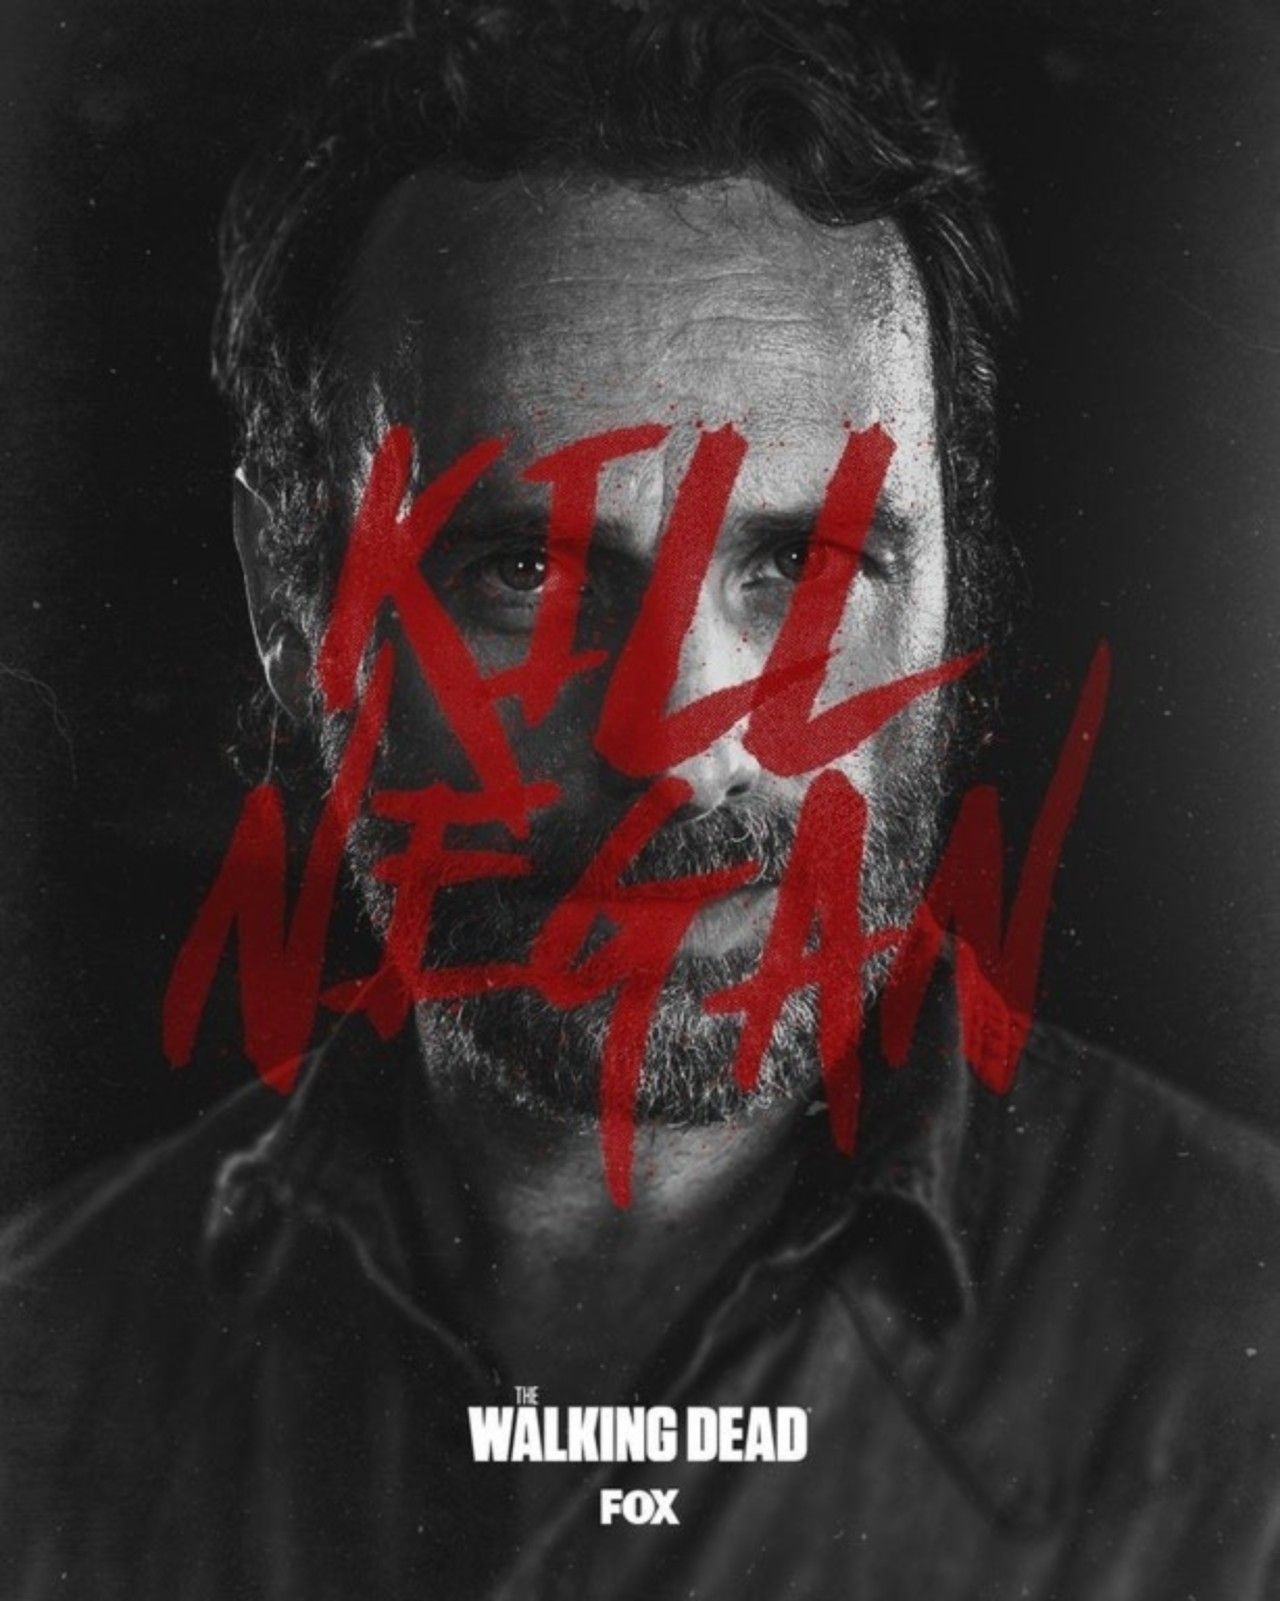 Season 8b Poster Kill Negan Walking Dead Series The Walking